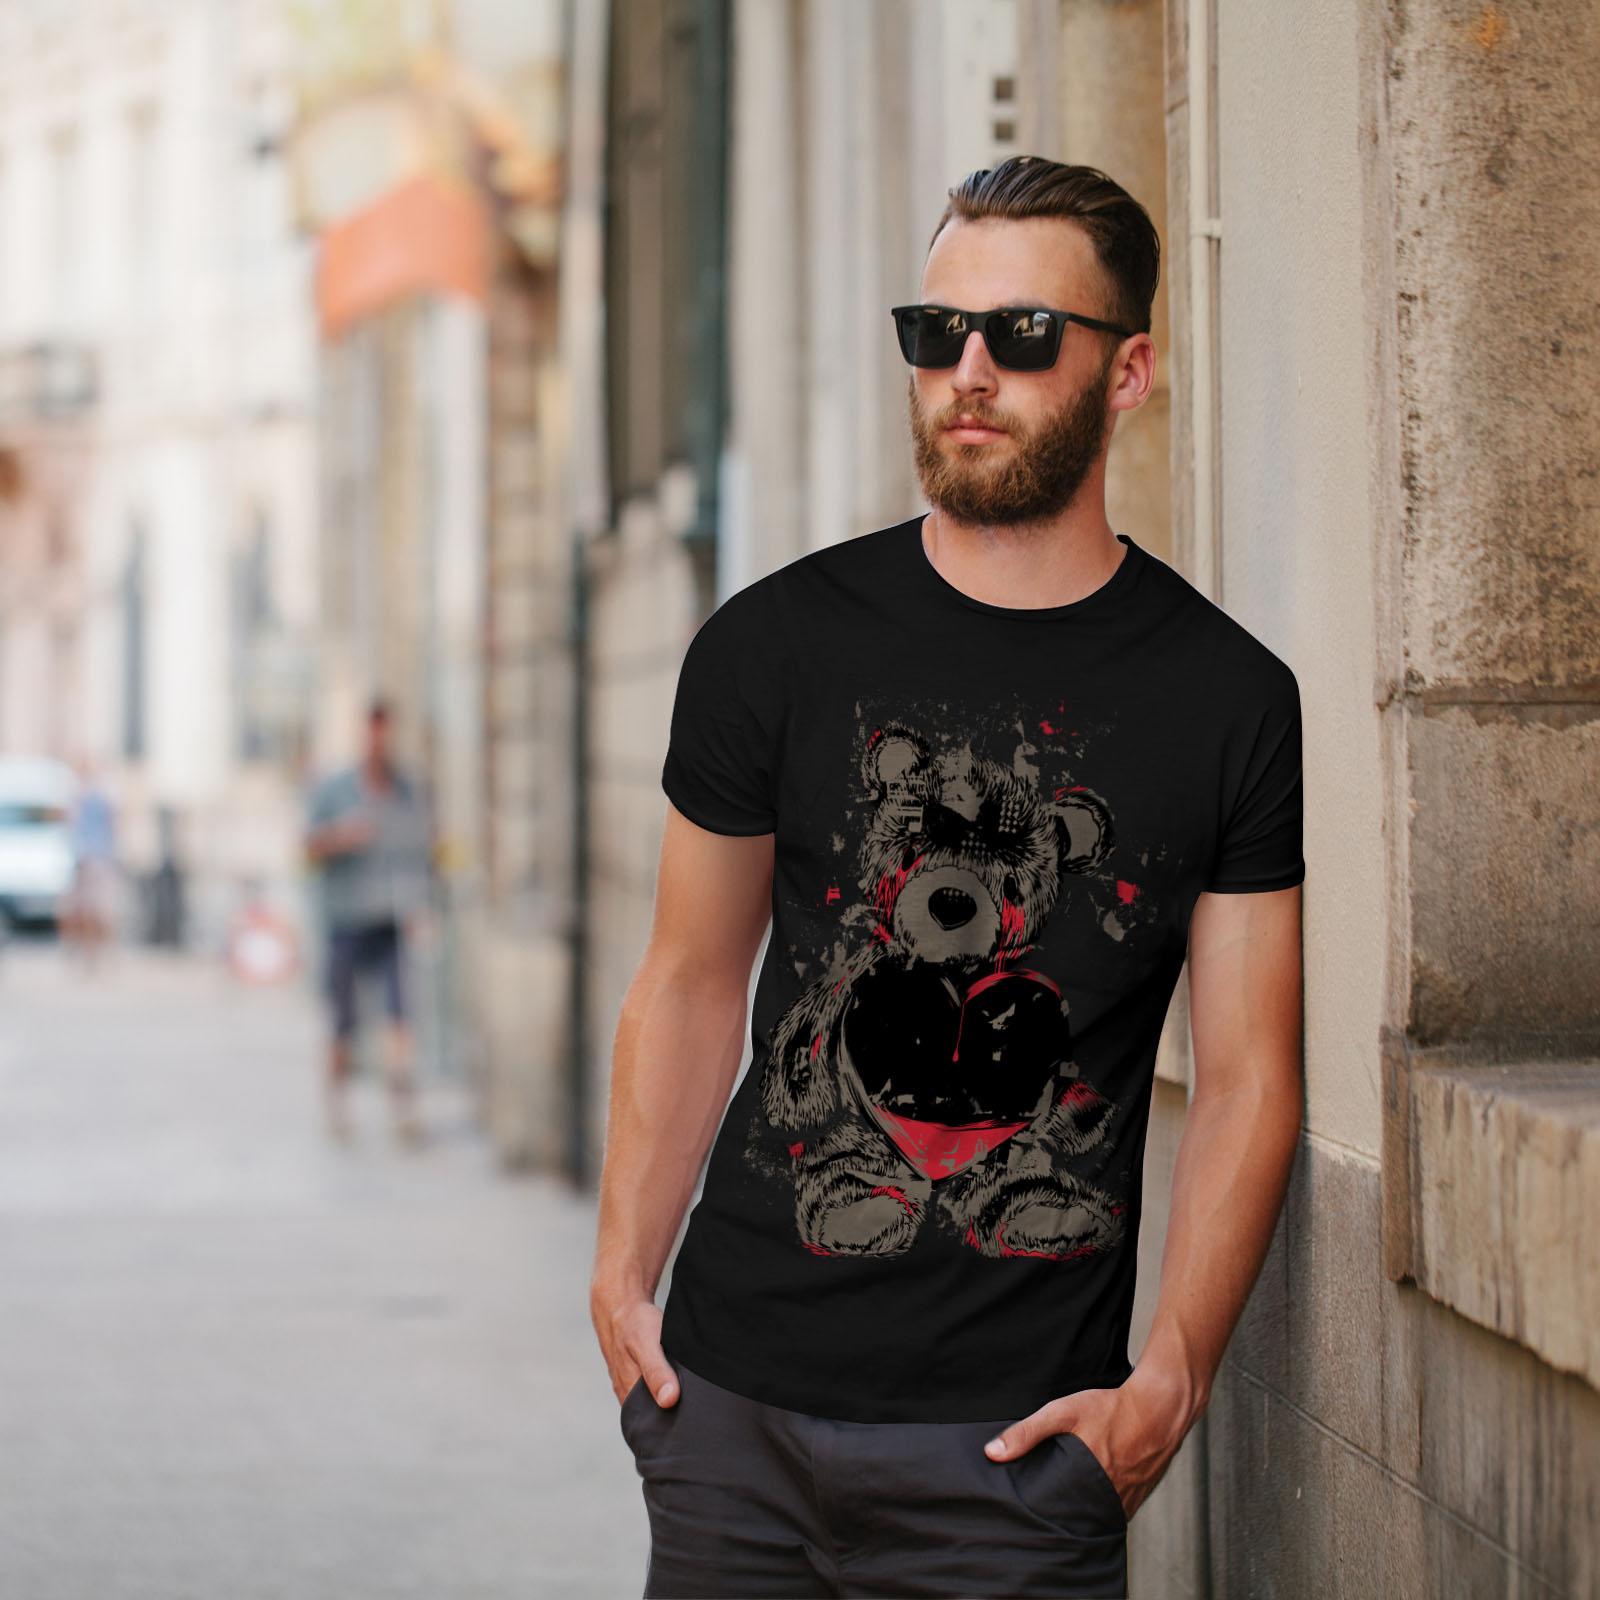 miniature 5 - Wellcoda Teddy Bear Love Hurt Mens T-shirt, Blood Graphic Design Printed Tee